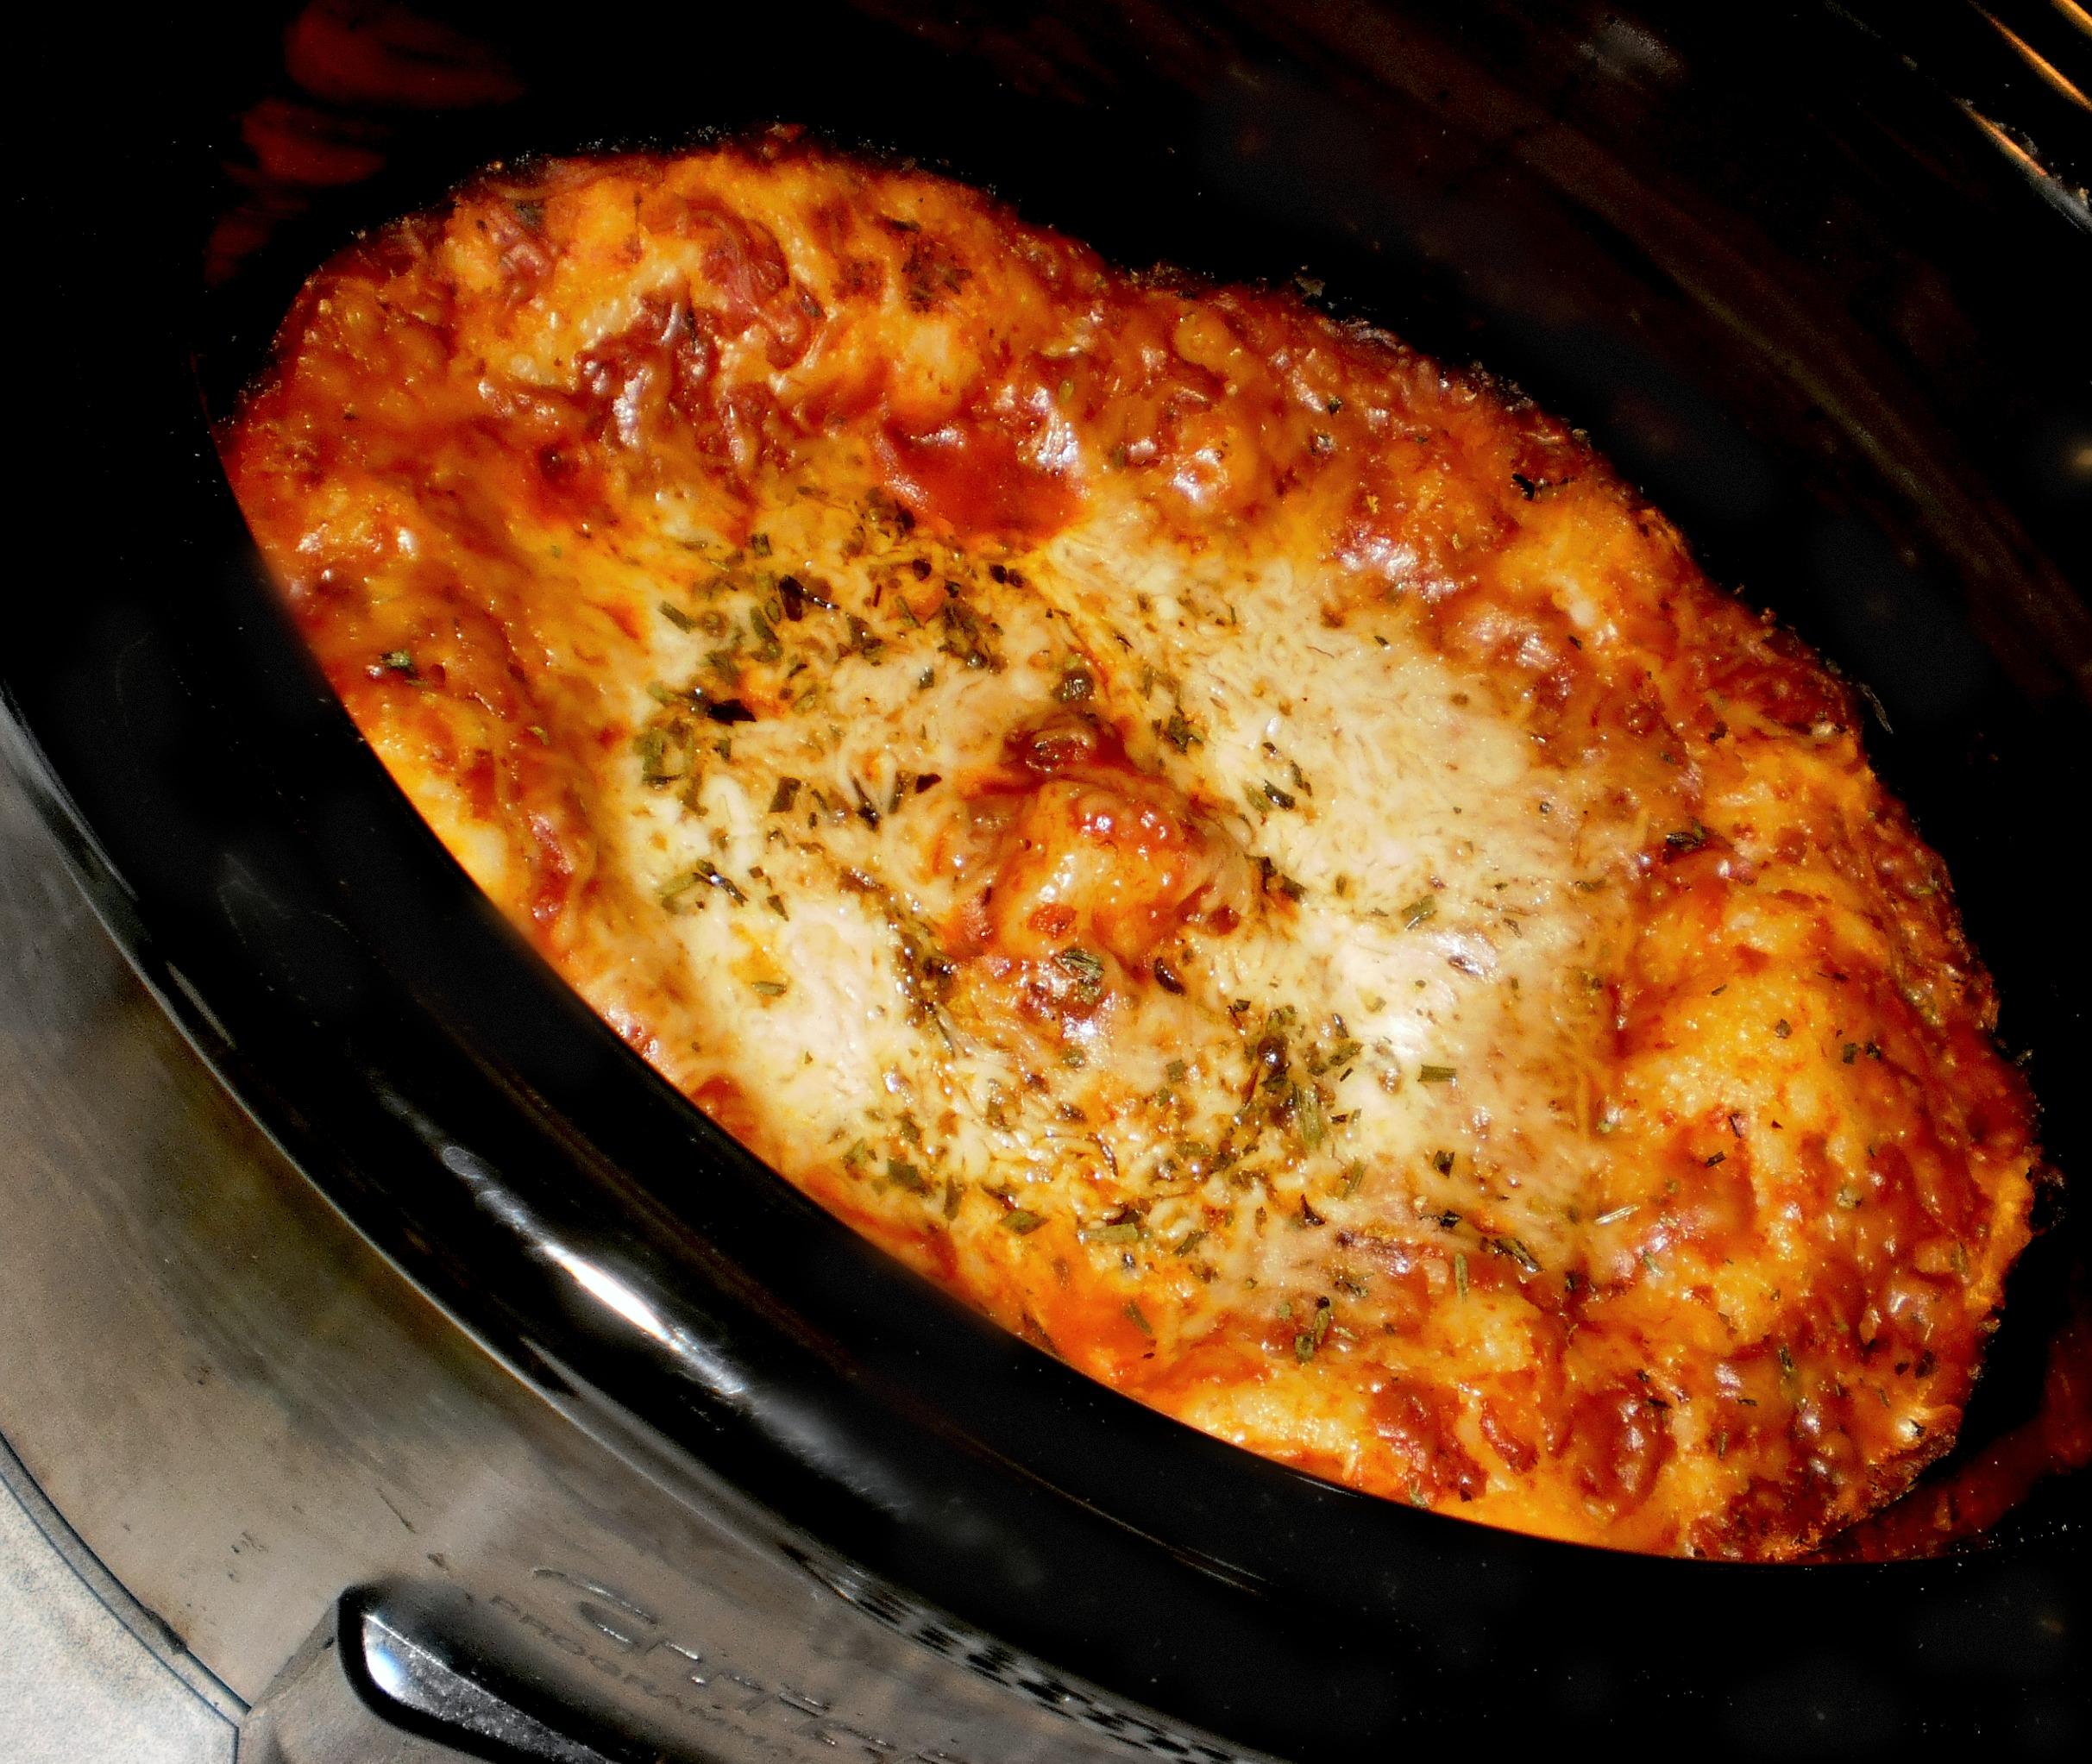 Rosemary's Original Crock Pot Pizza